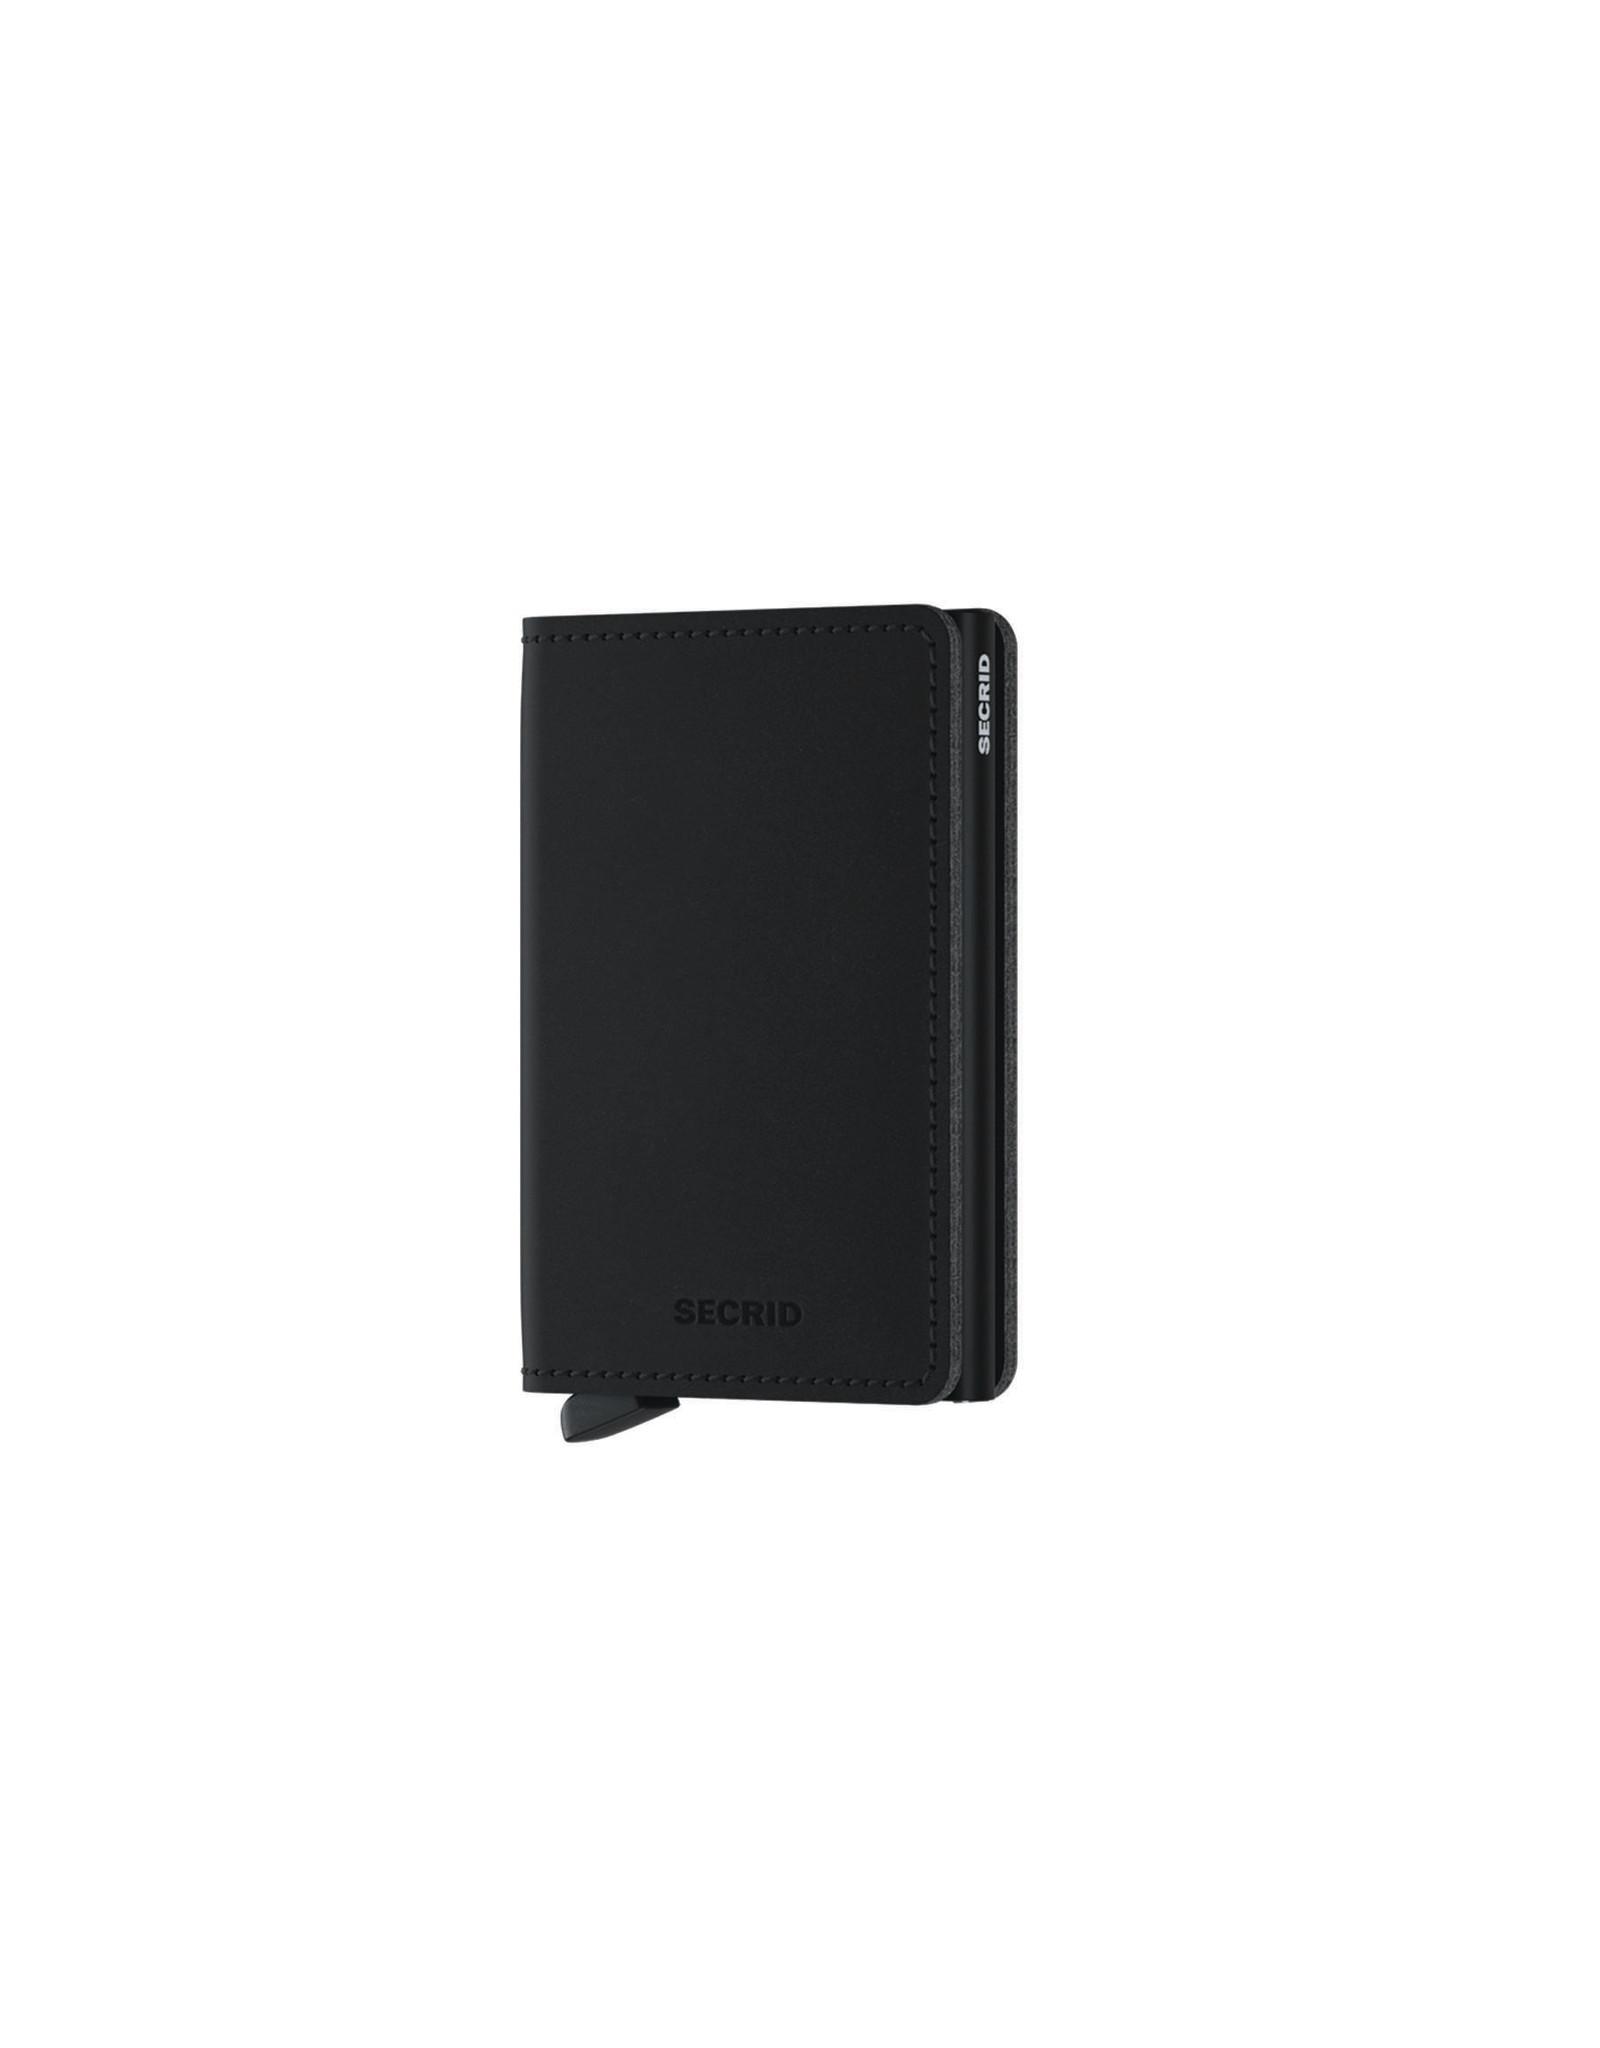 Secrid Slimwallet Vegan Soft Touch Black